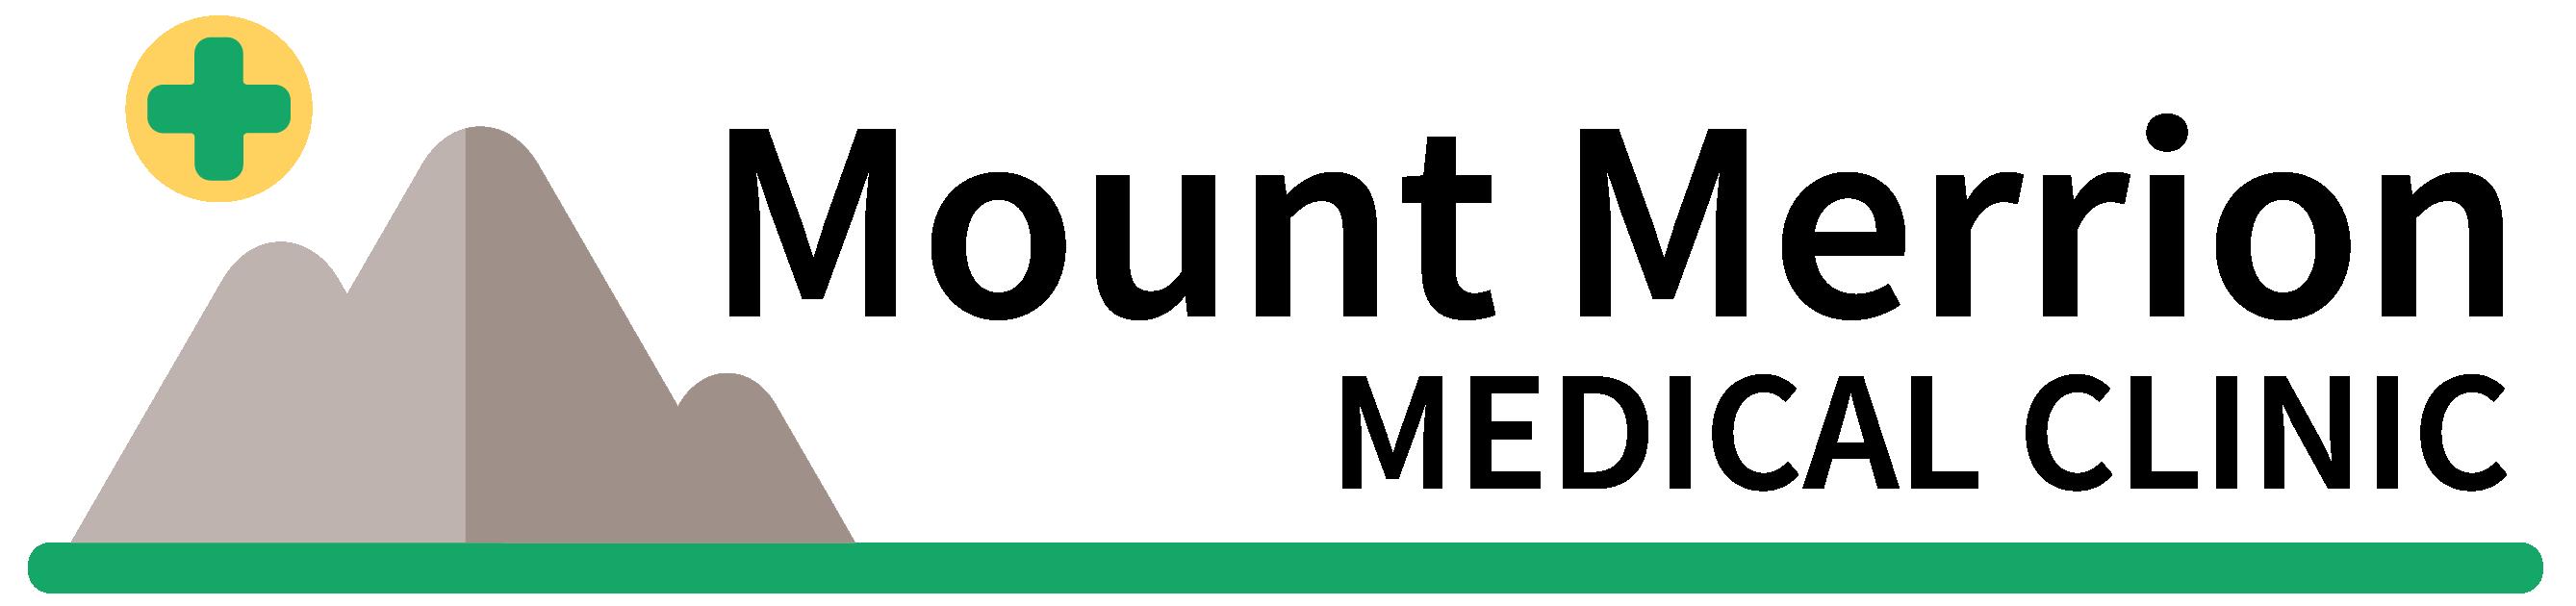 Mount Merrian Medical Clinic Logo